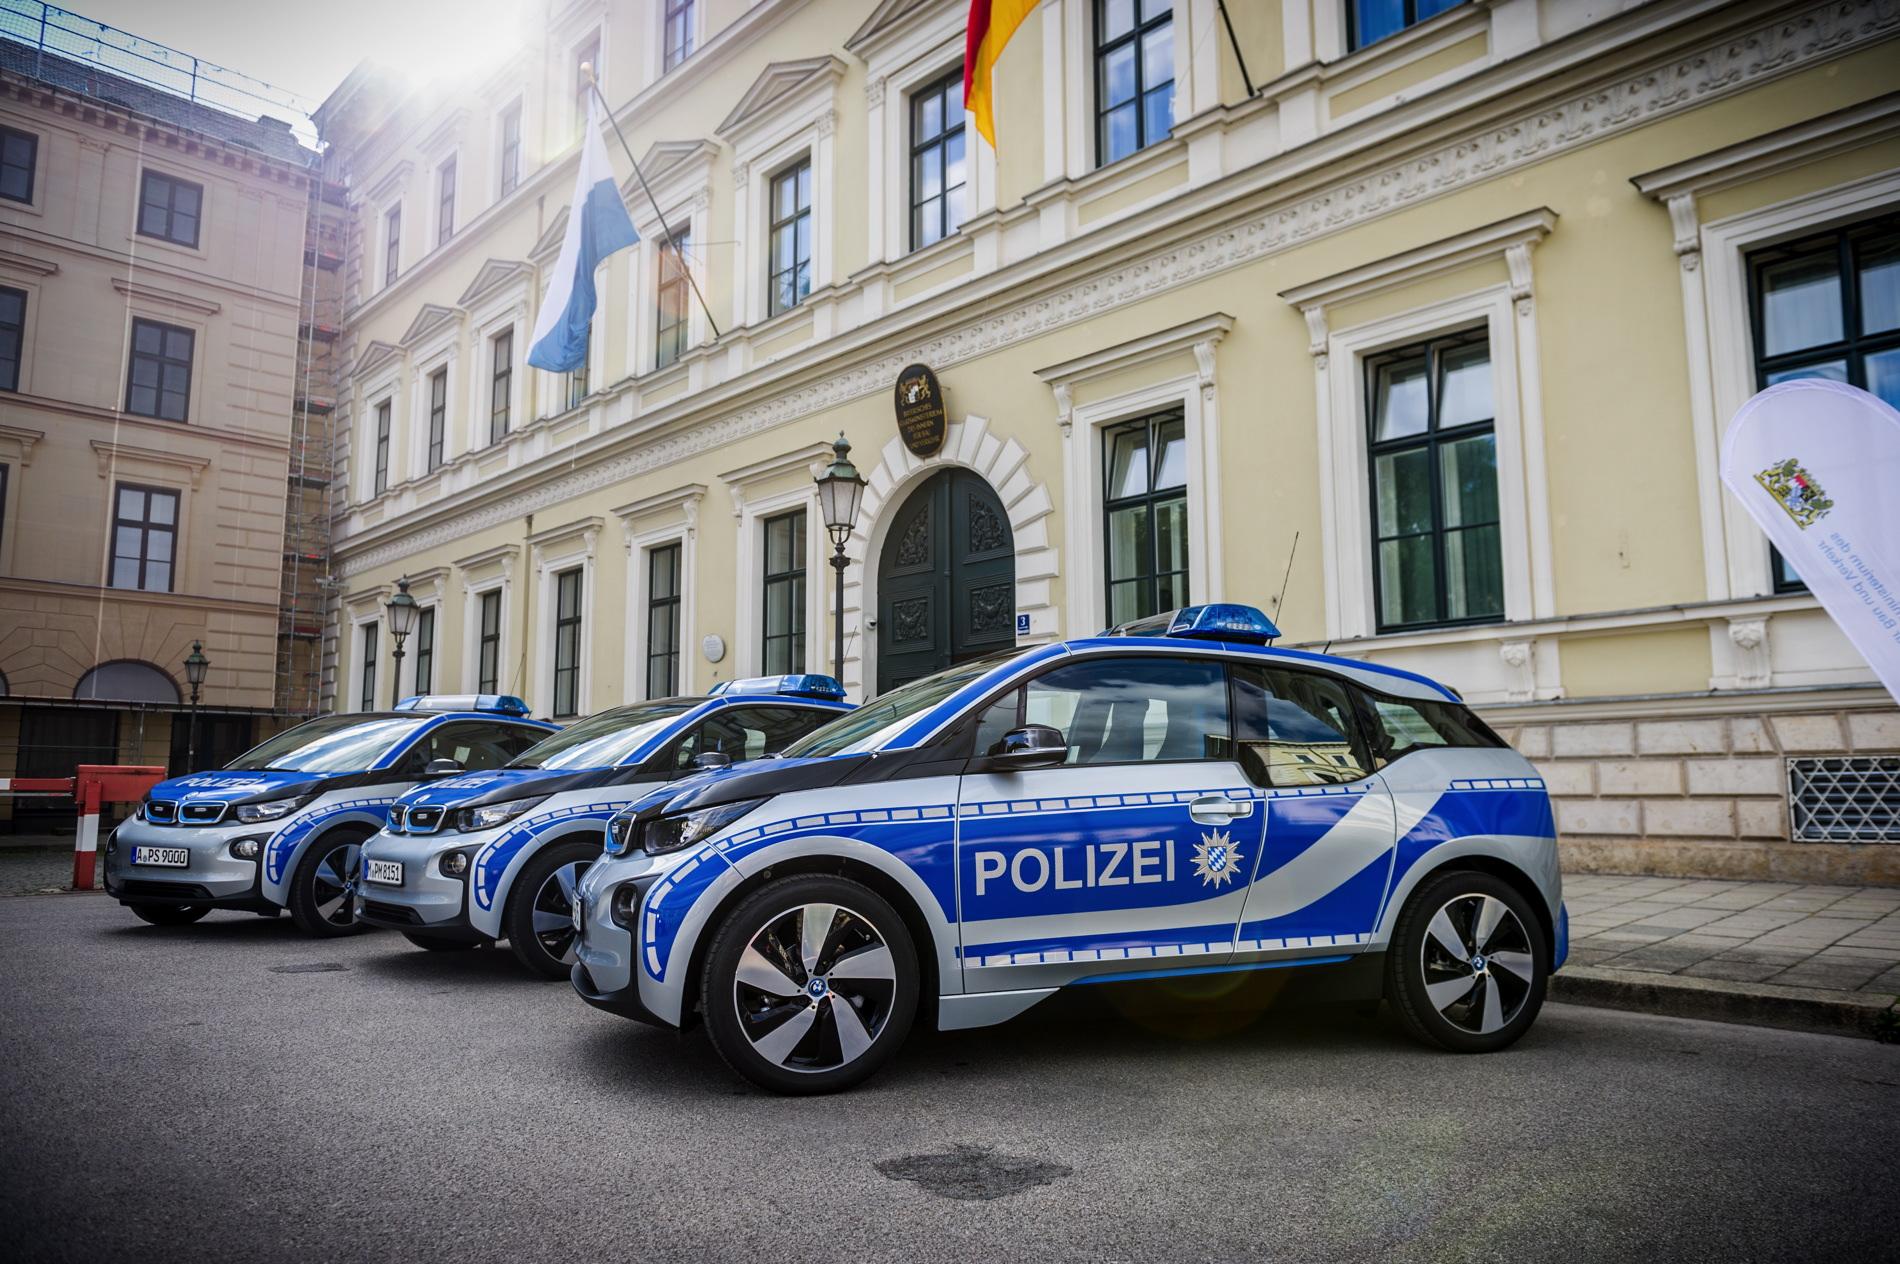 Munich Police Fleets Gets Bmw I3 Cars